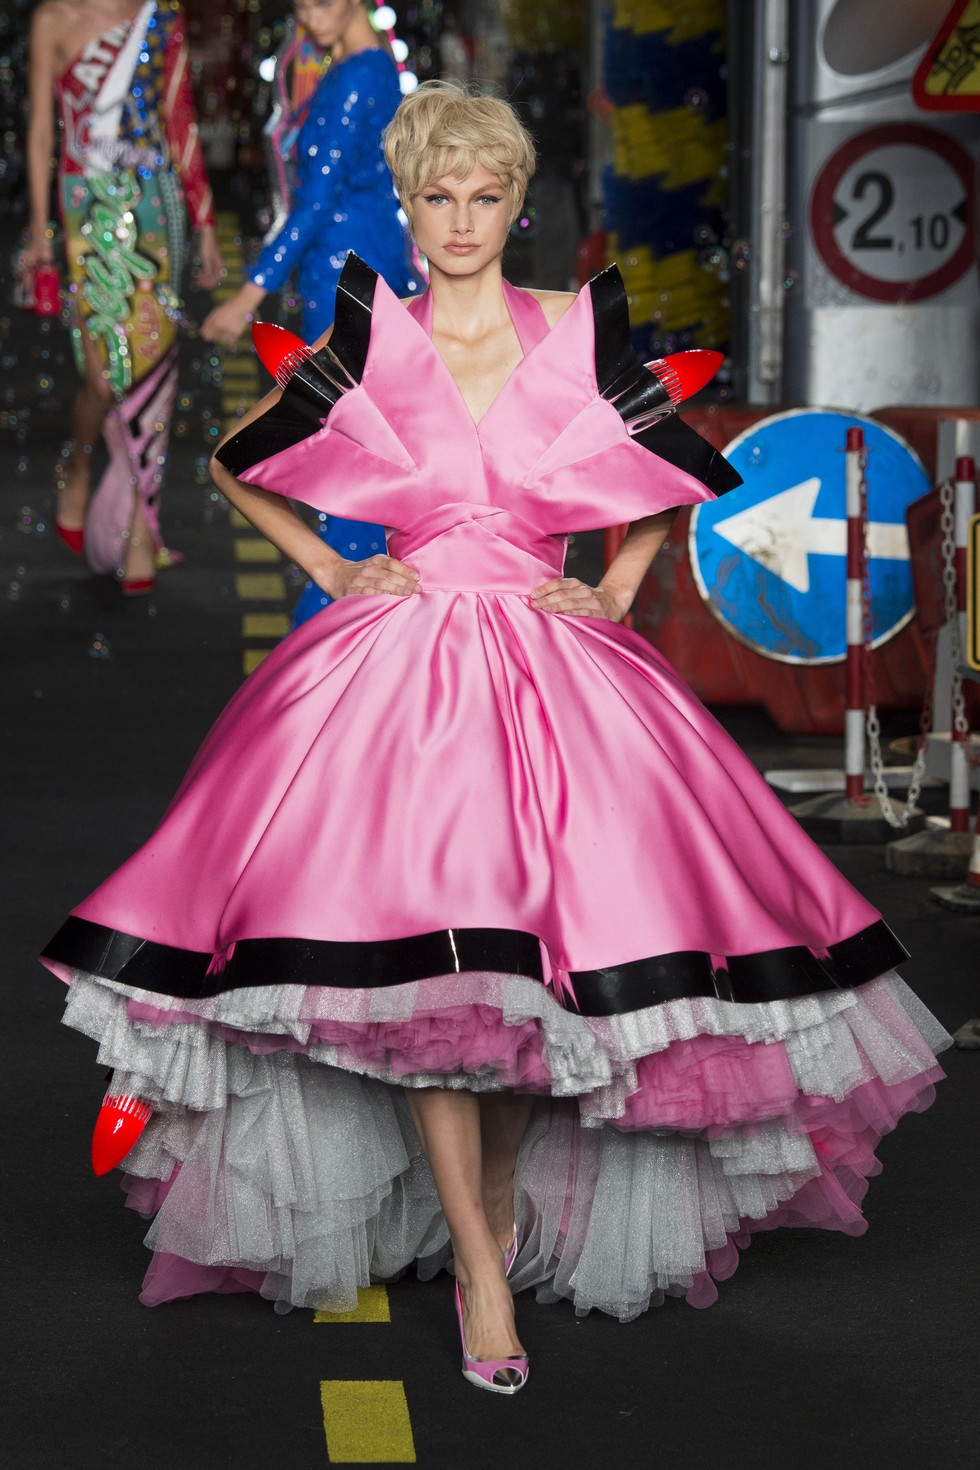 Milan Fashion Week 2016 Spring Summer News Day two best moments-Moschino Milan Fashion Week 2016 Spring Summer News: Day two best moments Milan Fashion Week 2016 Spring Summer News: Day two best moments Milan Fashion Week 2016 Spring Summer News Day two best moments Moschino 4